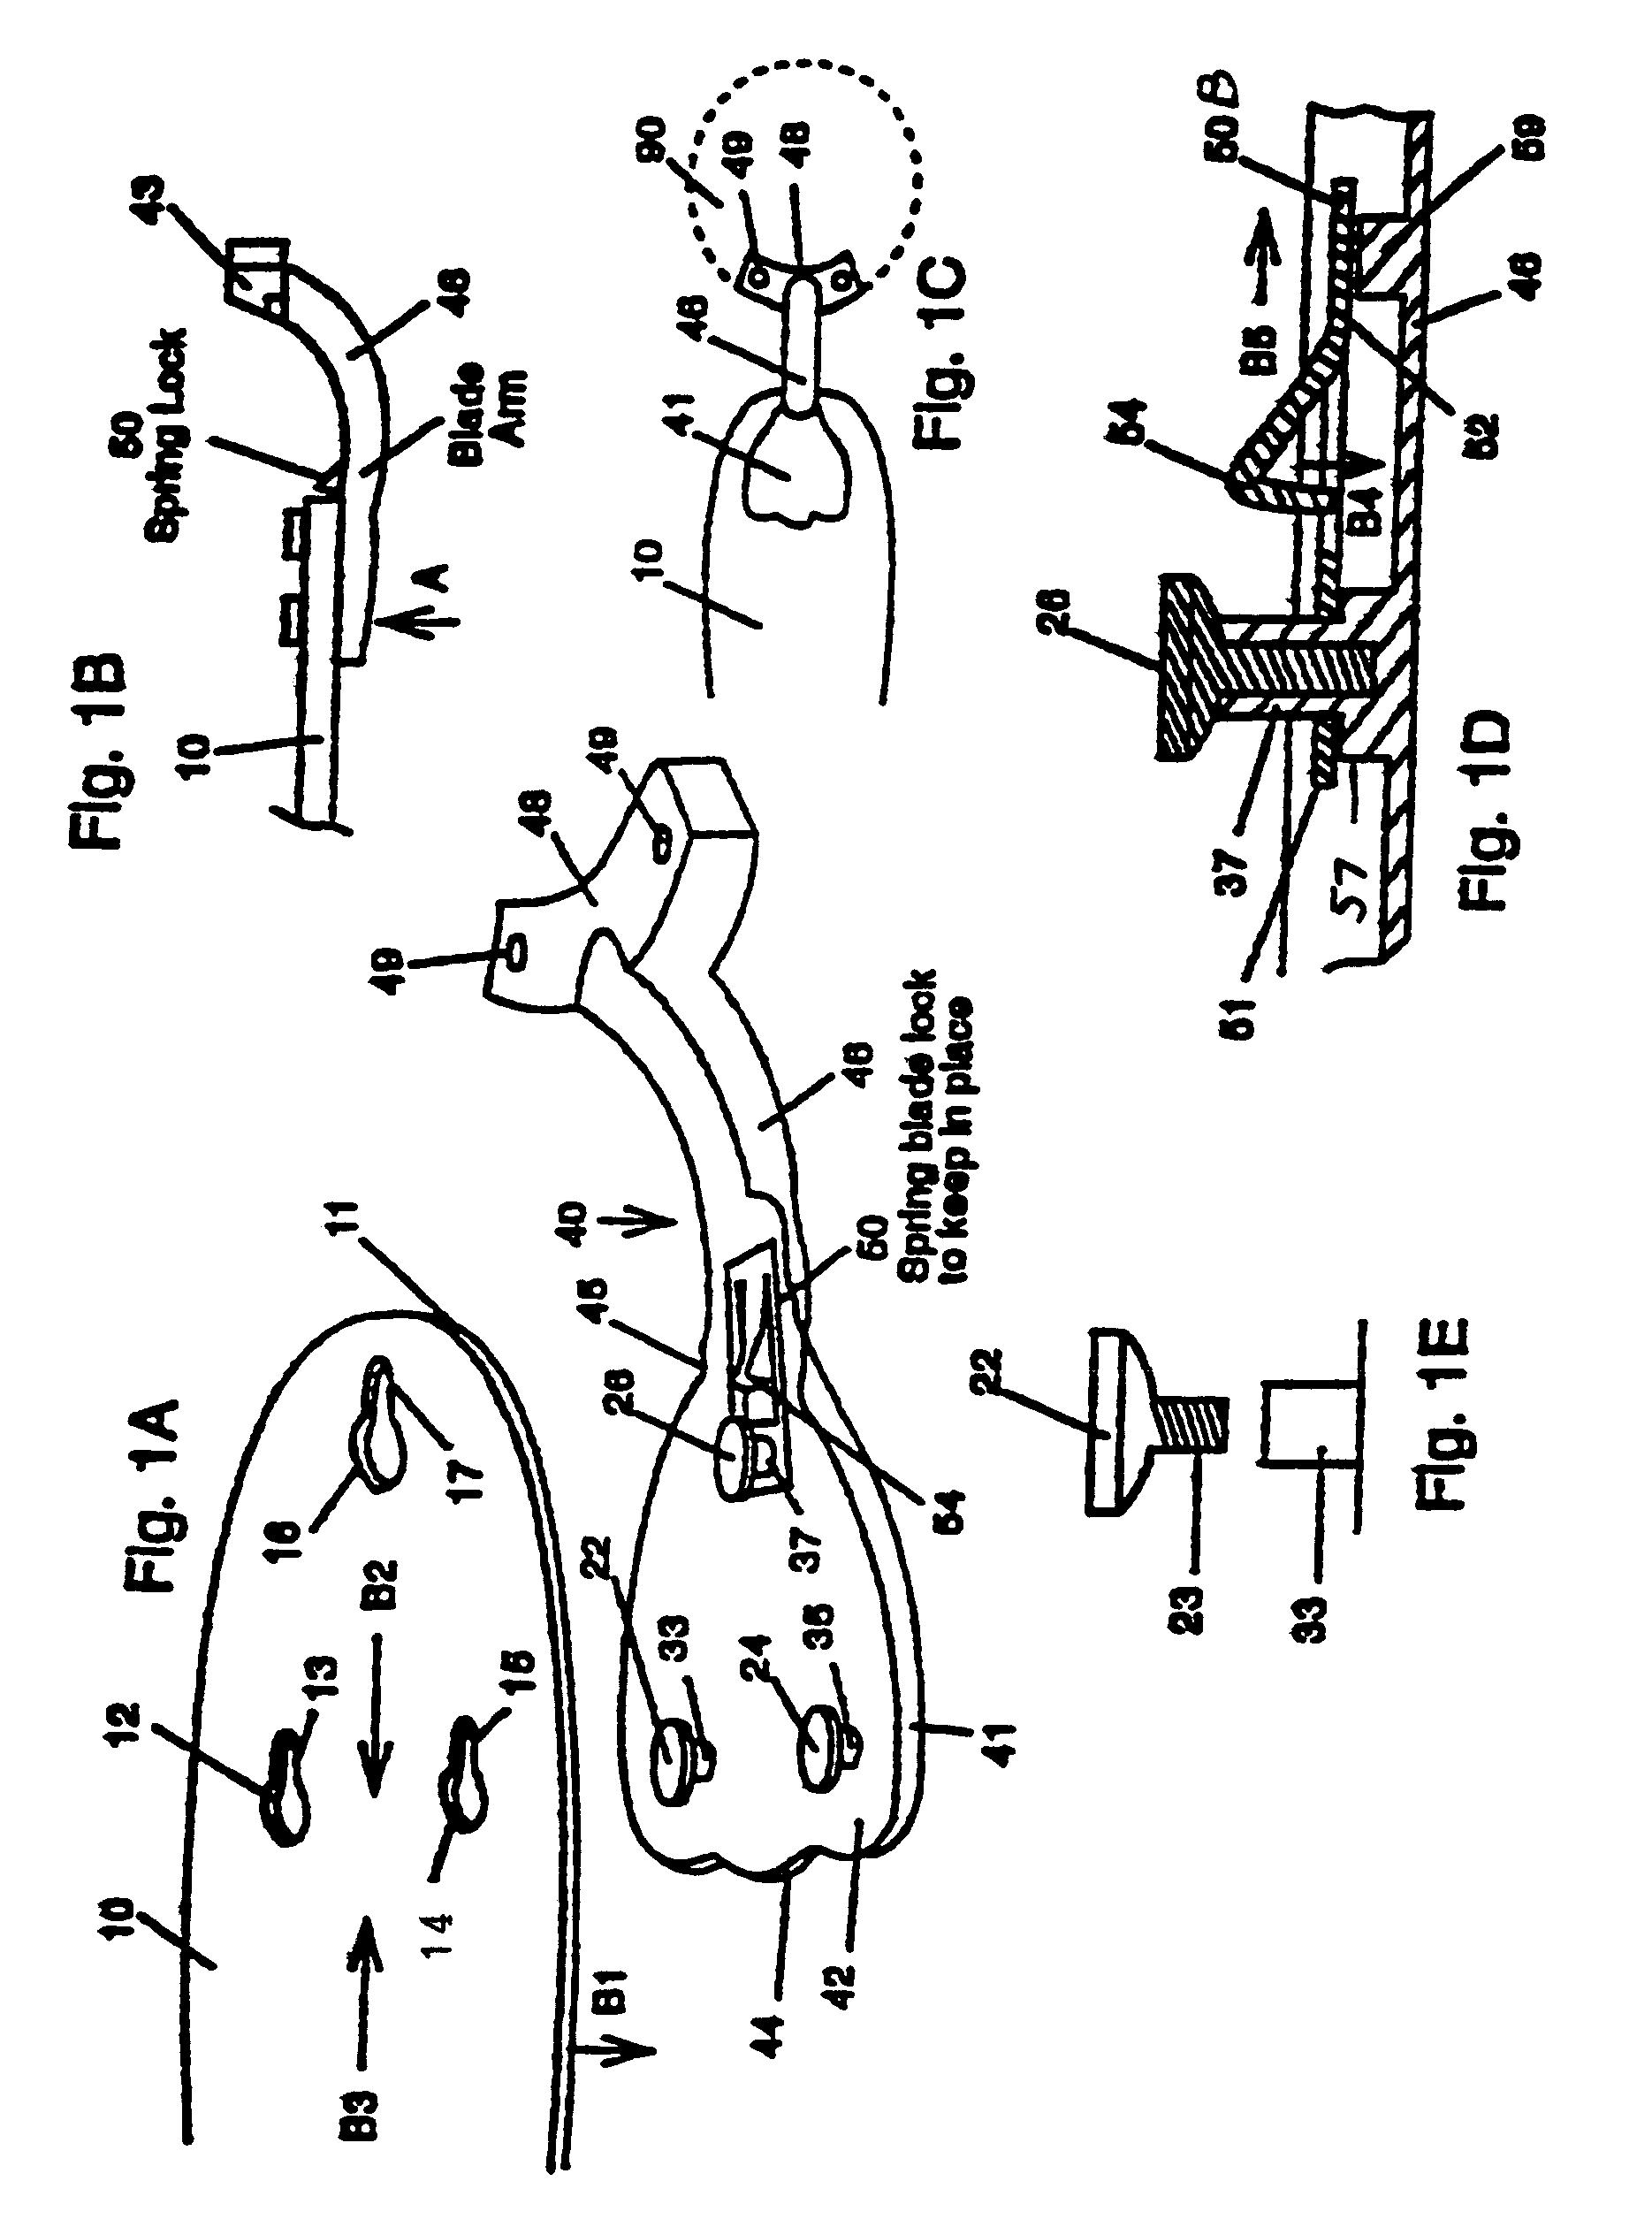 patent us 7 281 899 b1 Air Conditioner Motor Wiring Diagram patent images patent images